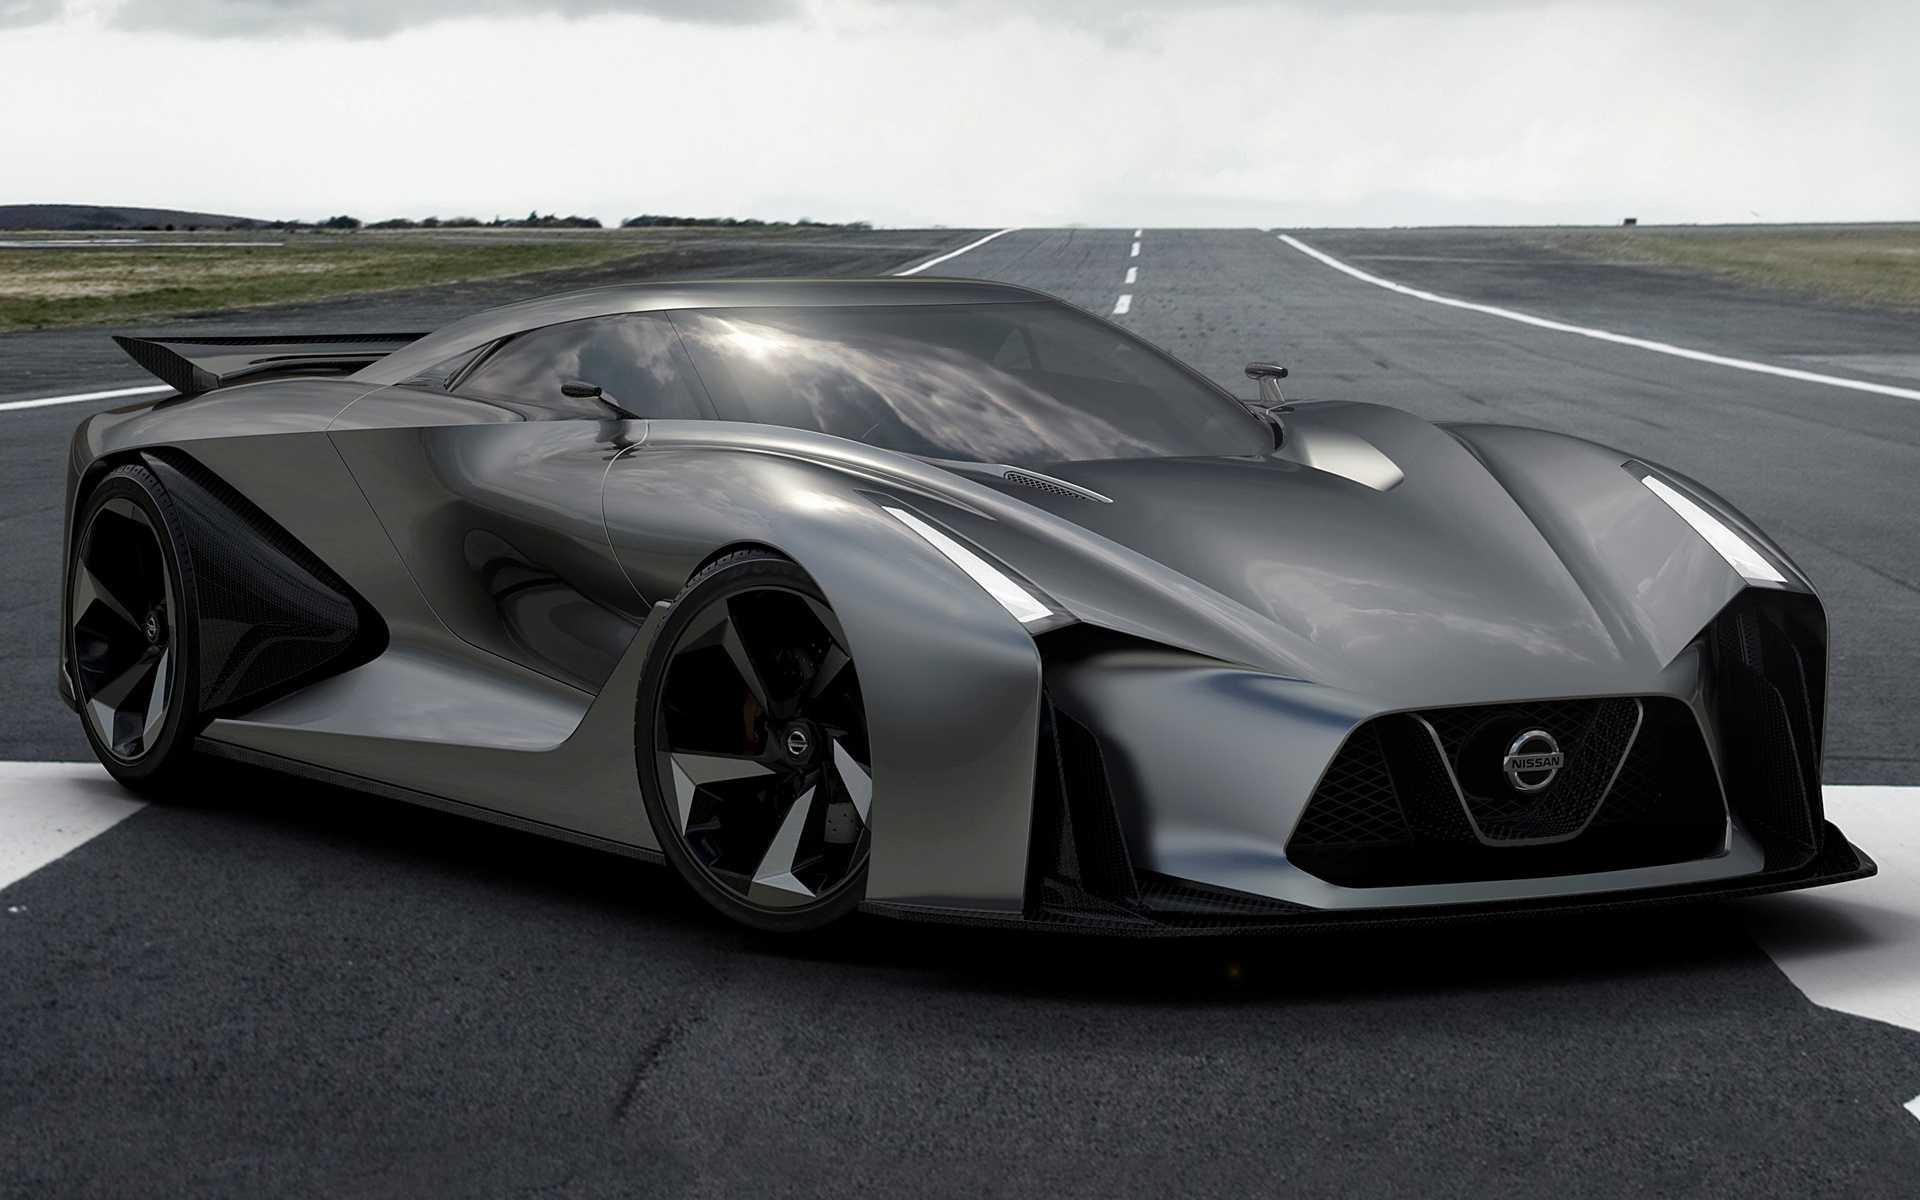 Nissan murano 2020 – кроссовер ниссан мурано пережил рестайлинг